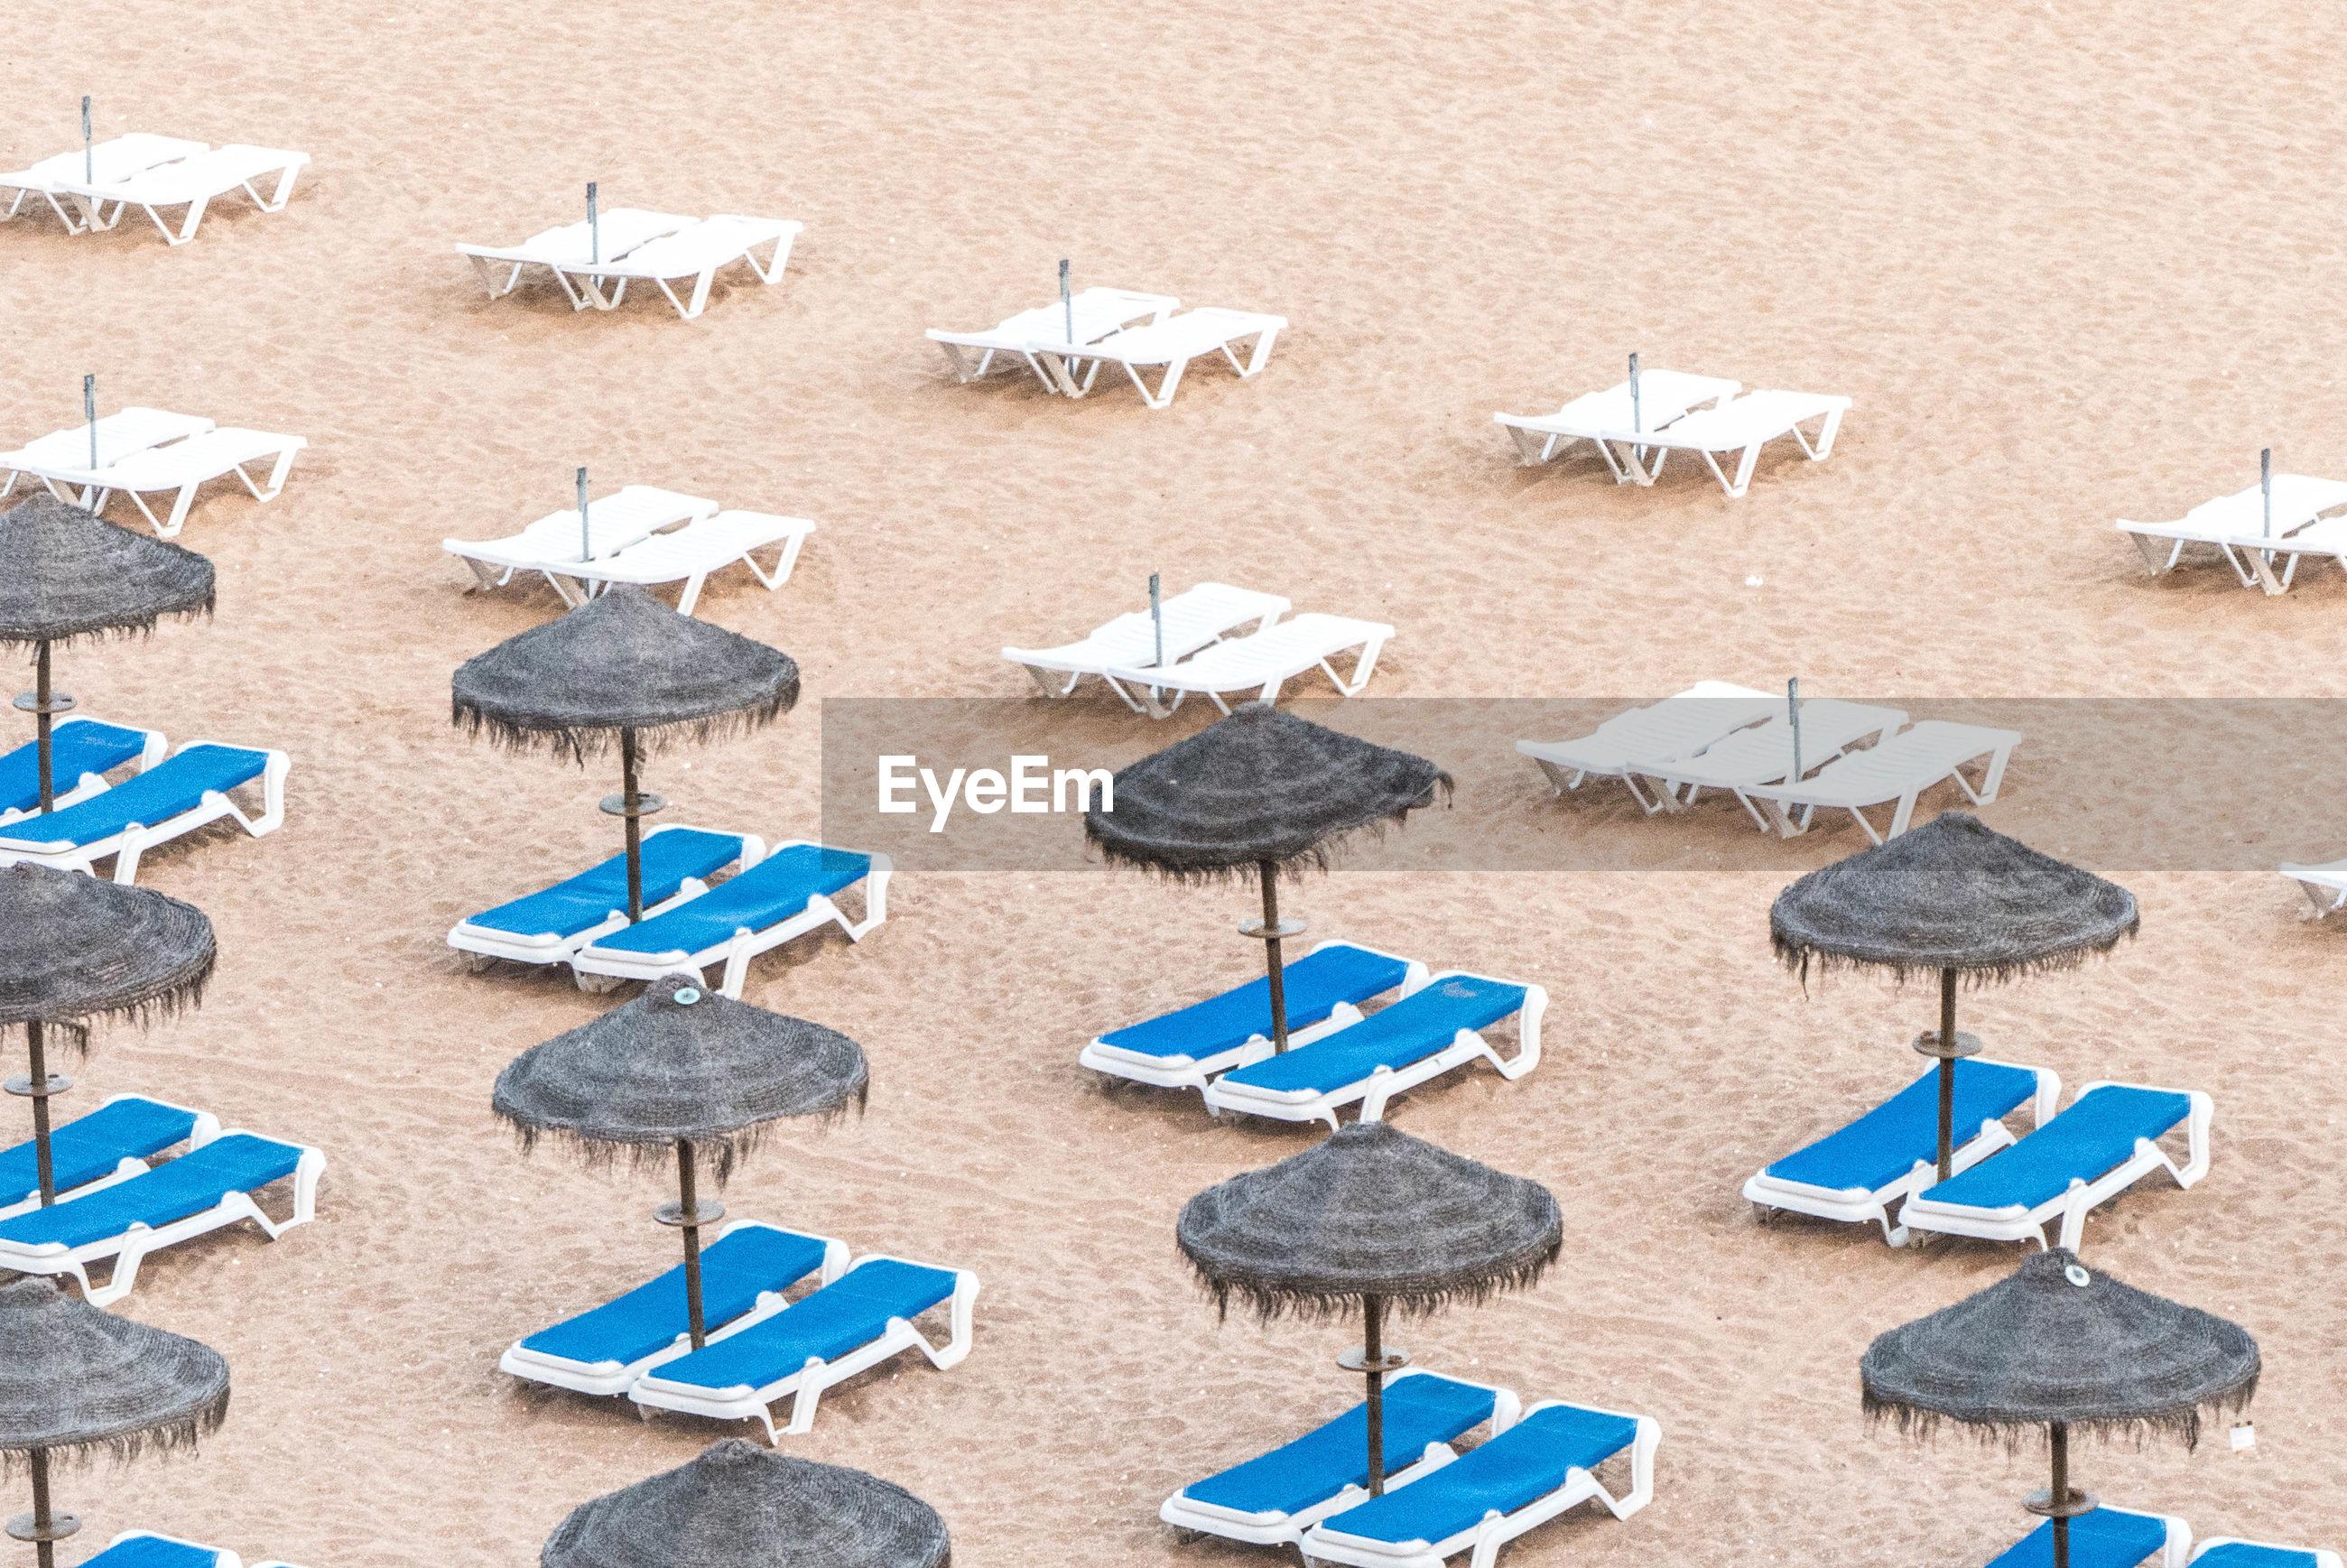 Row of umbrellas